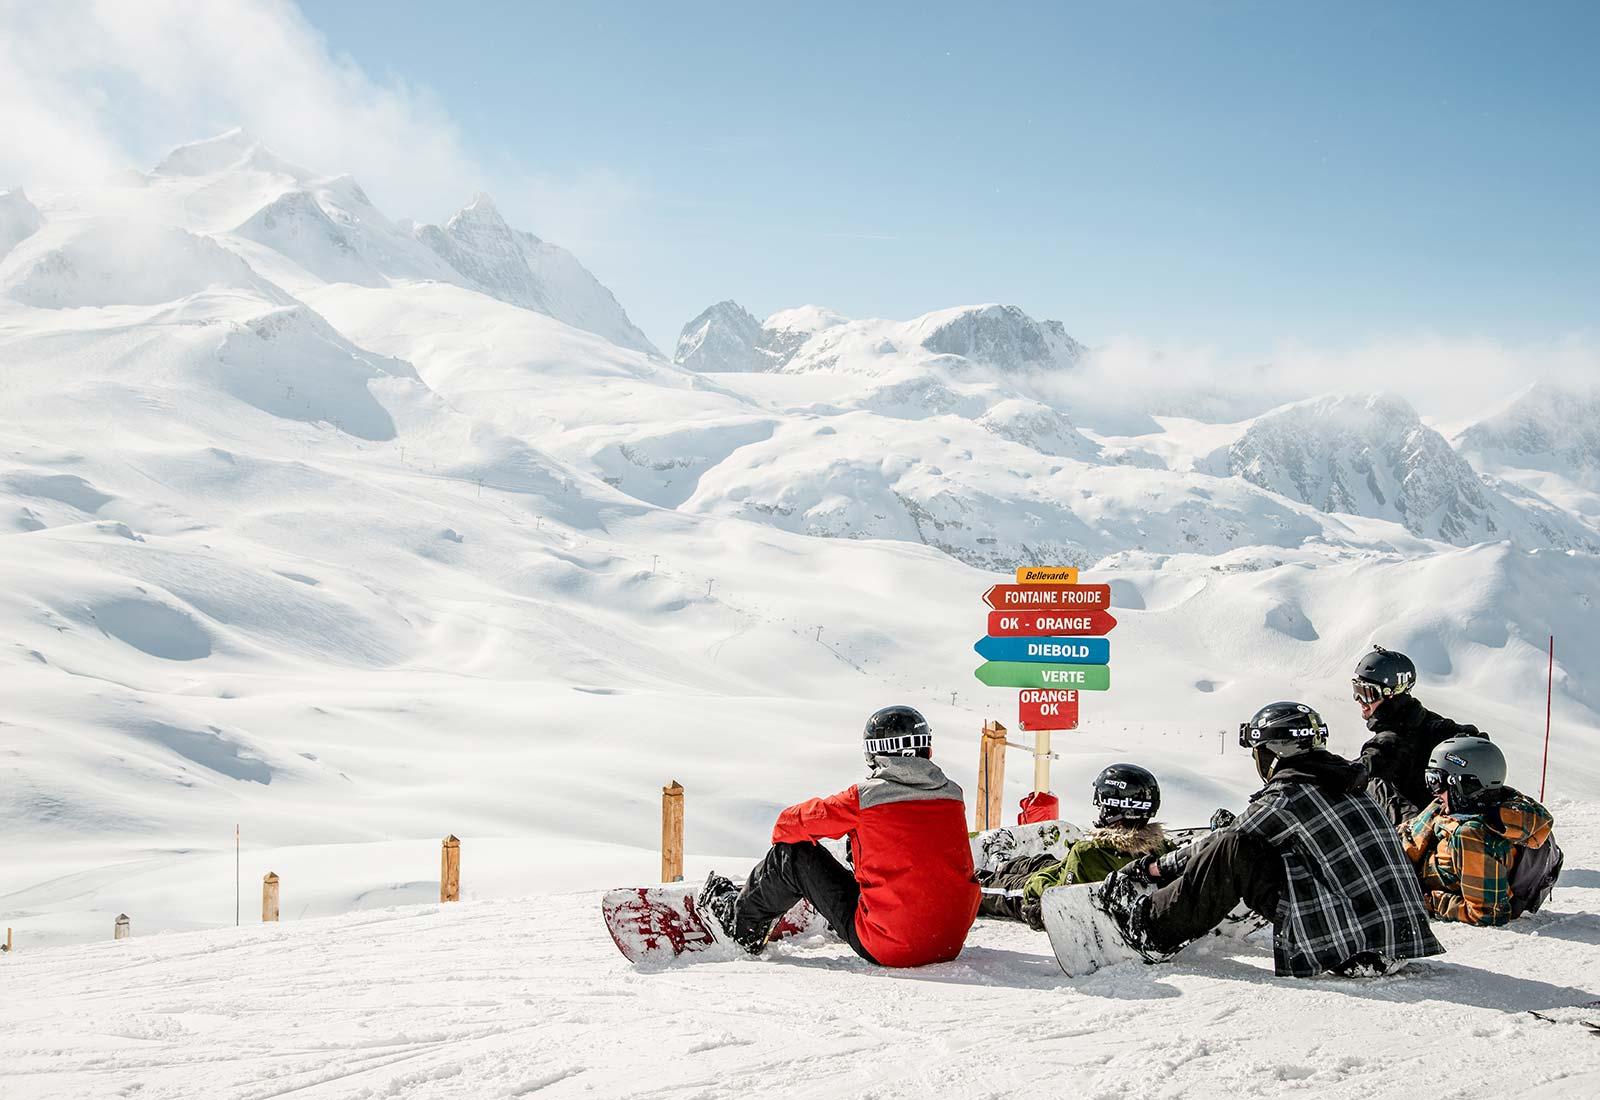 Tignes snowboarding